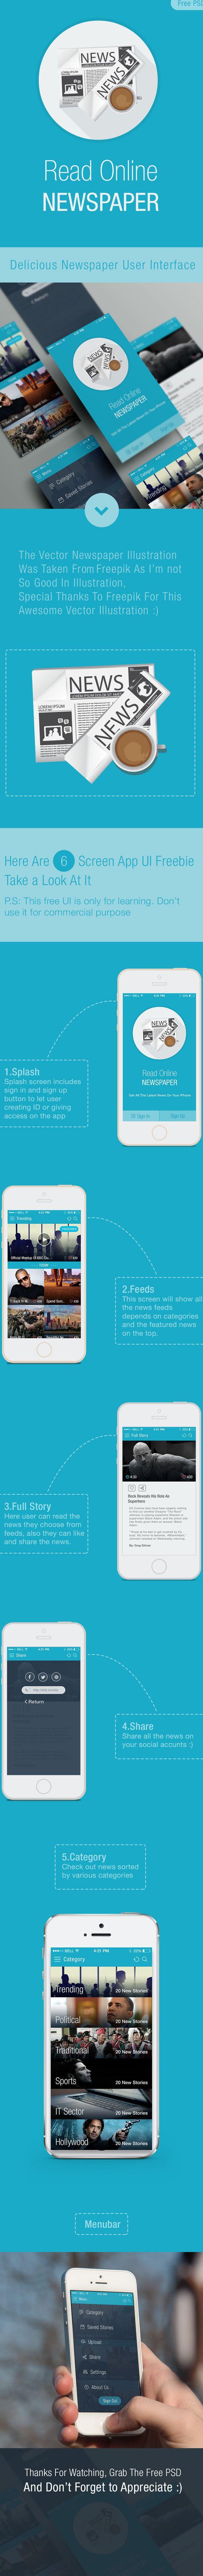 Online News Paper iOS APP UI (Free PSD) on Behance